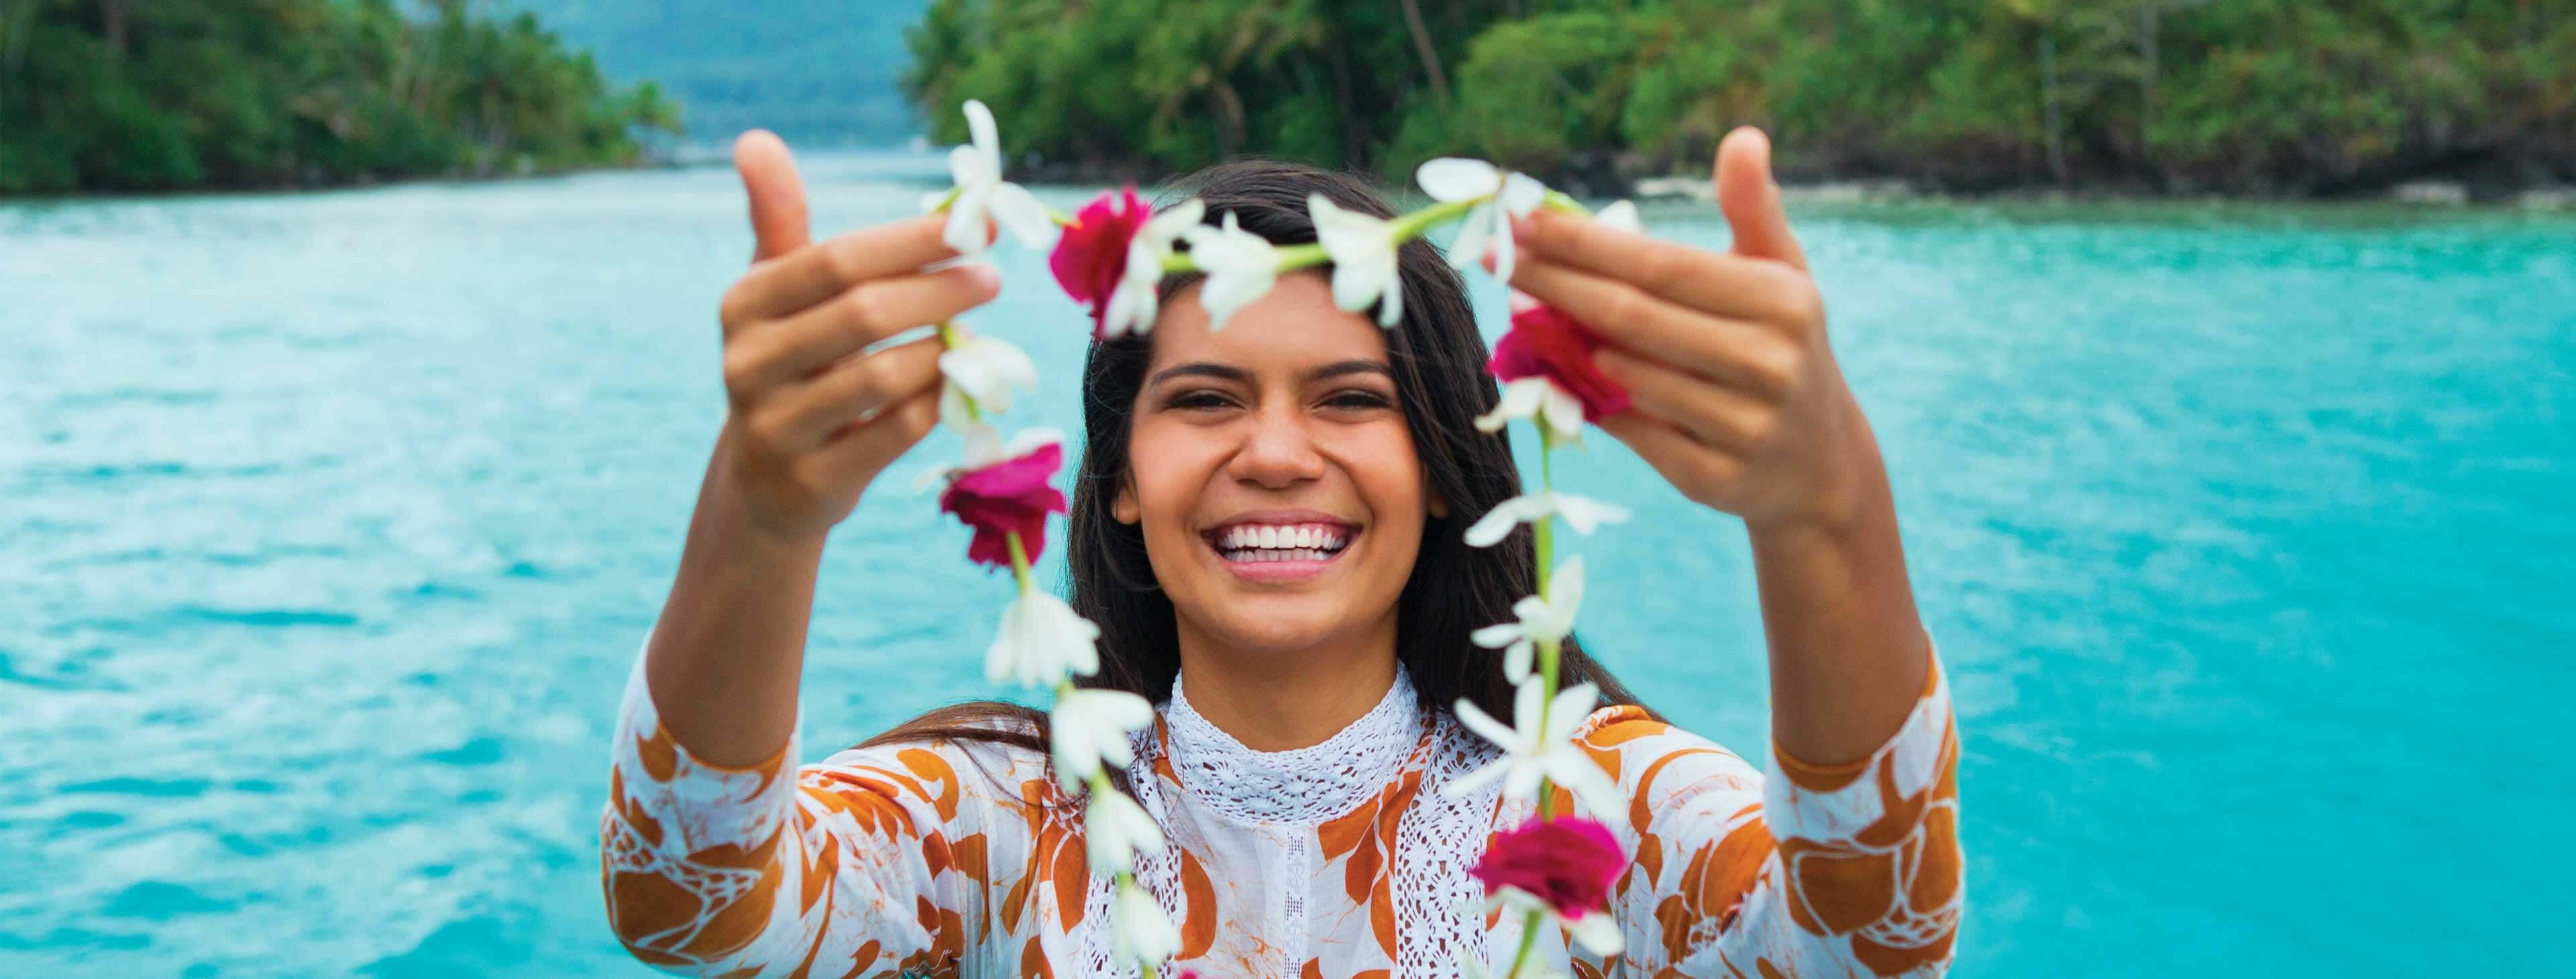 French blue volera sur tahiti l 39 ann e prochaine pagtour - Office de tourisme tahiti ...